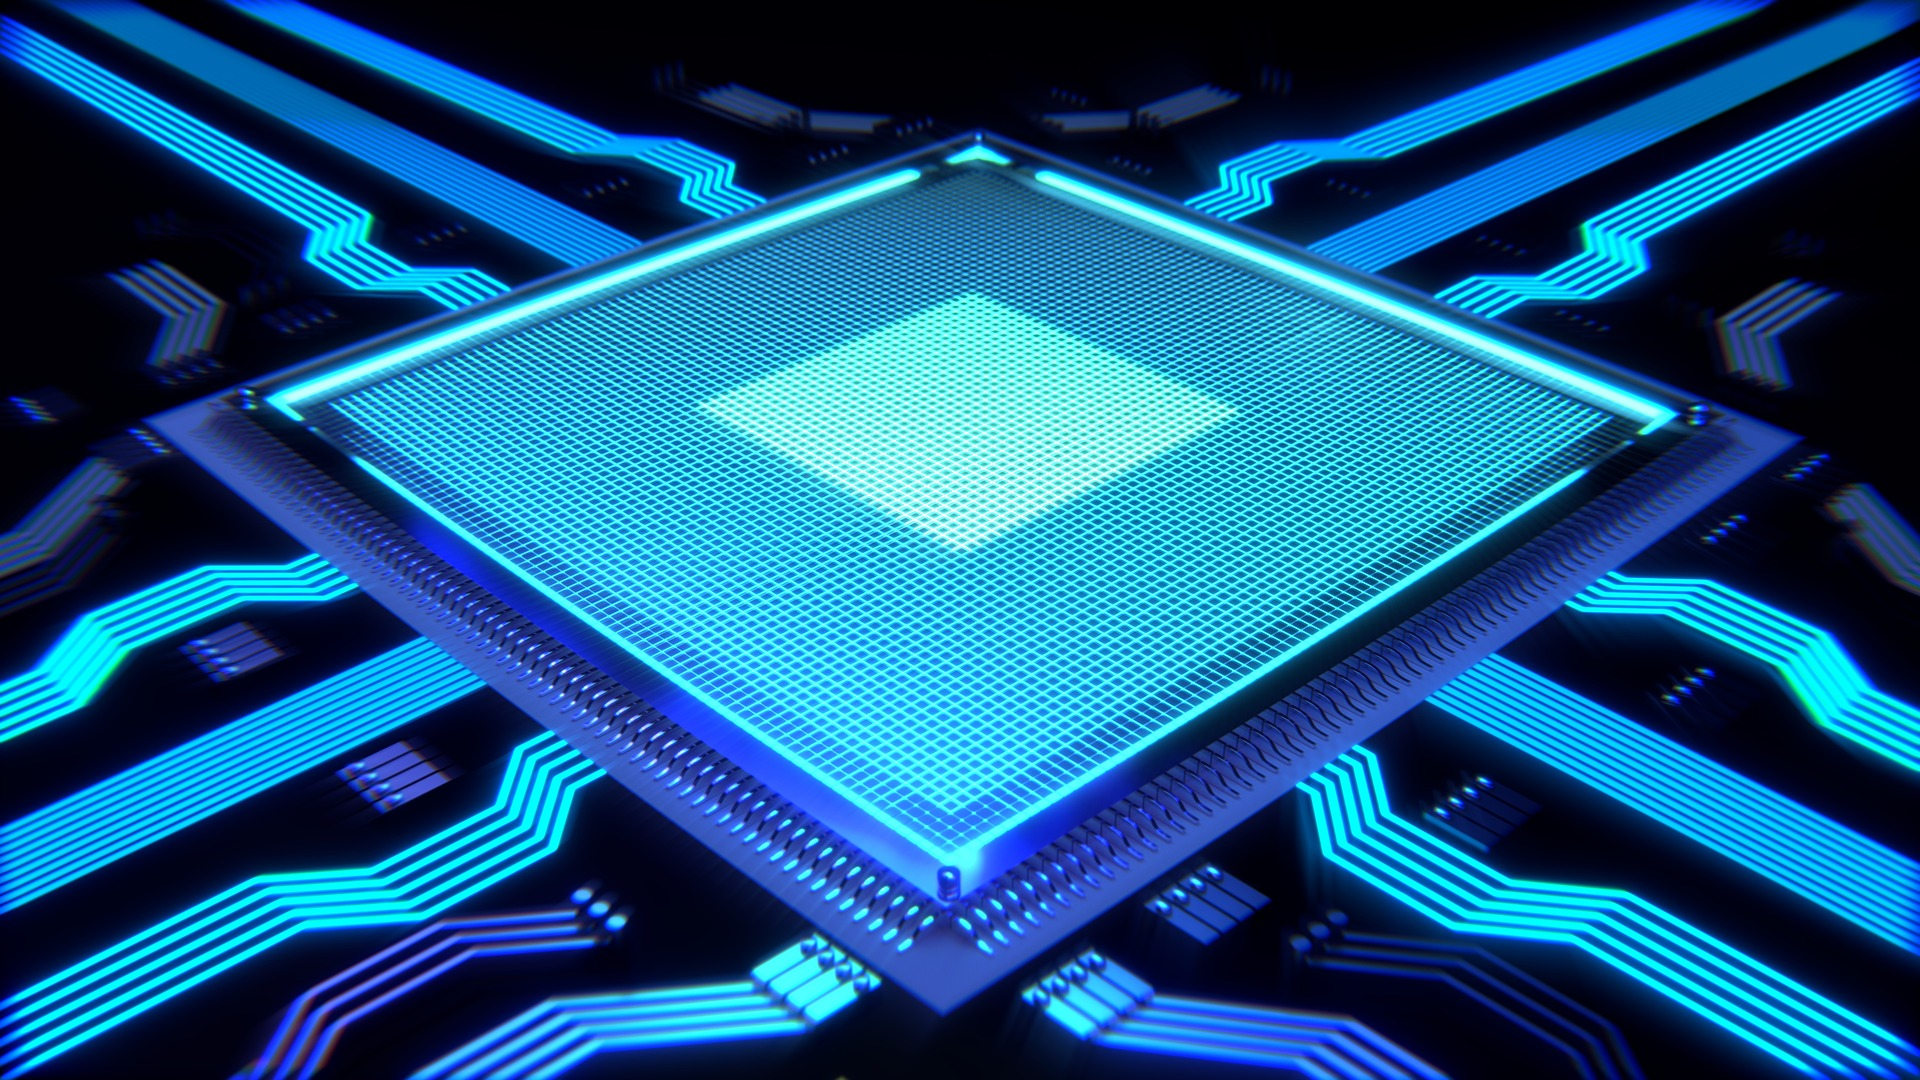 from https://pixabay.com/en/processor-cpu-computer-chip-board-2217771/